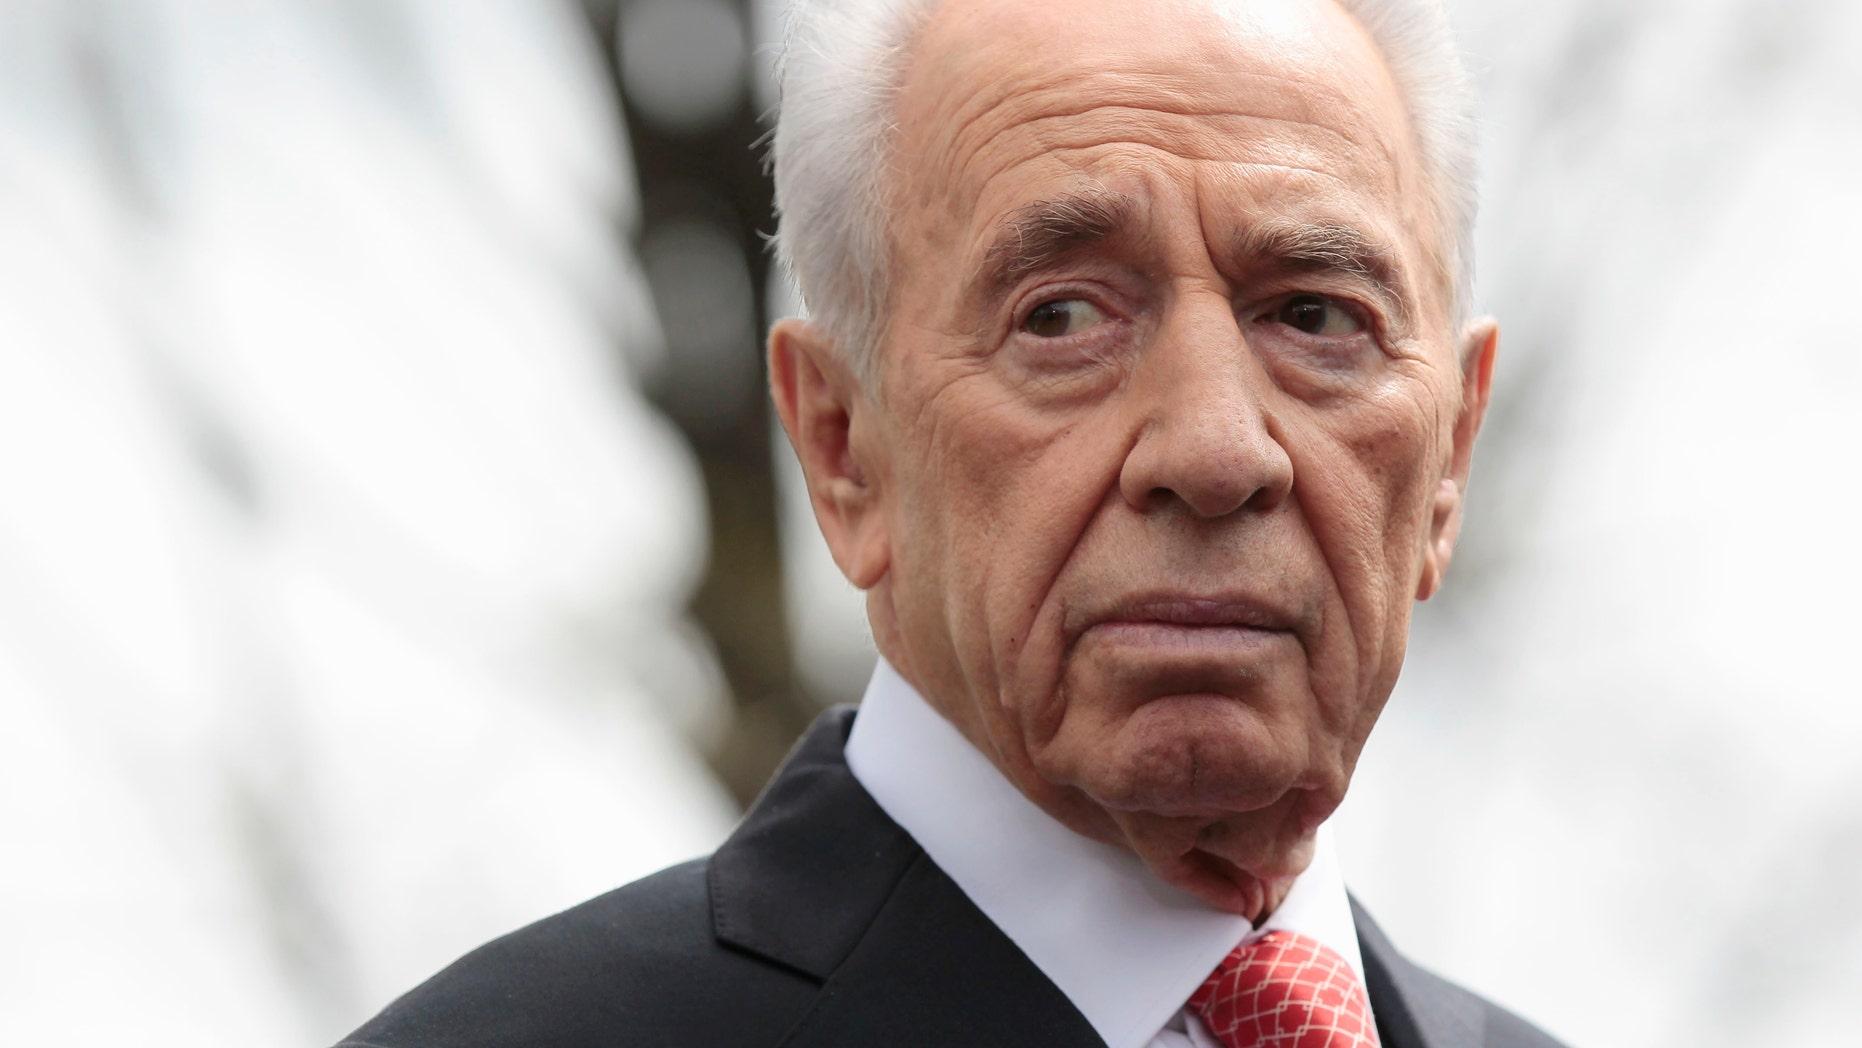 April 5, 2011 - FILE photo of Israeli President Shimon Peres.